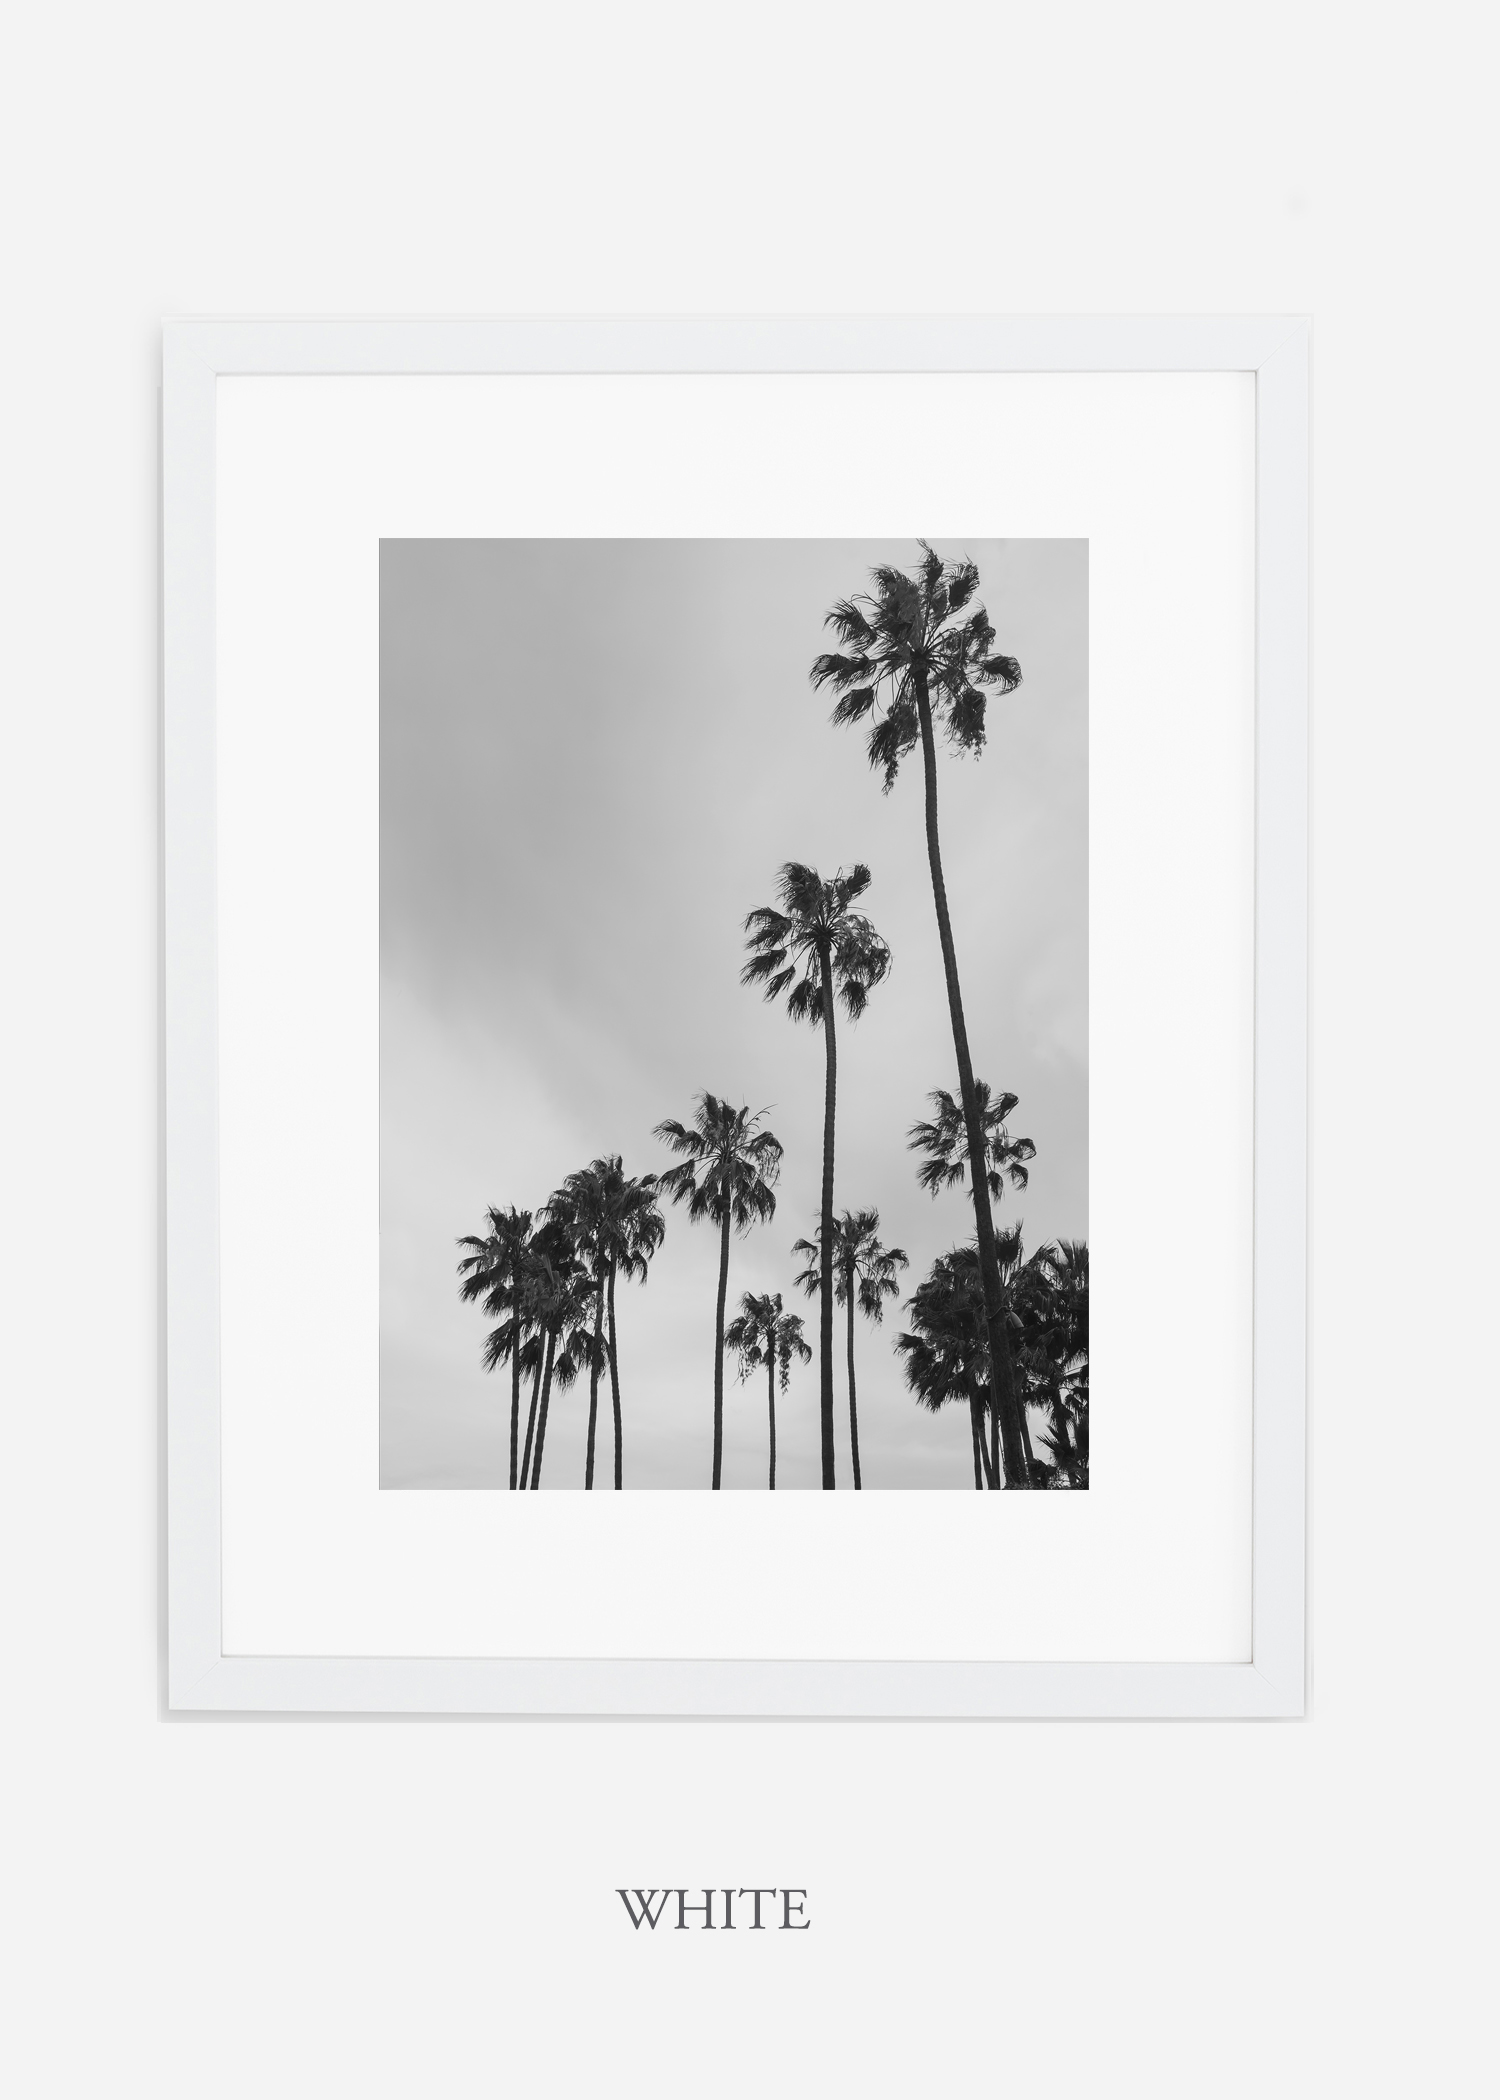 interiordesign_california_losangeles_palmtree_whiteframe.jpg